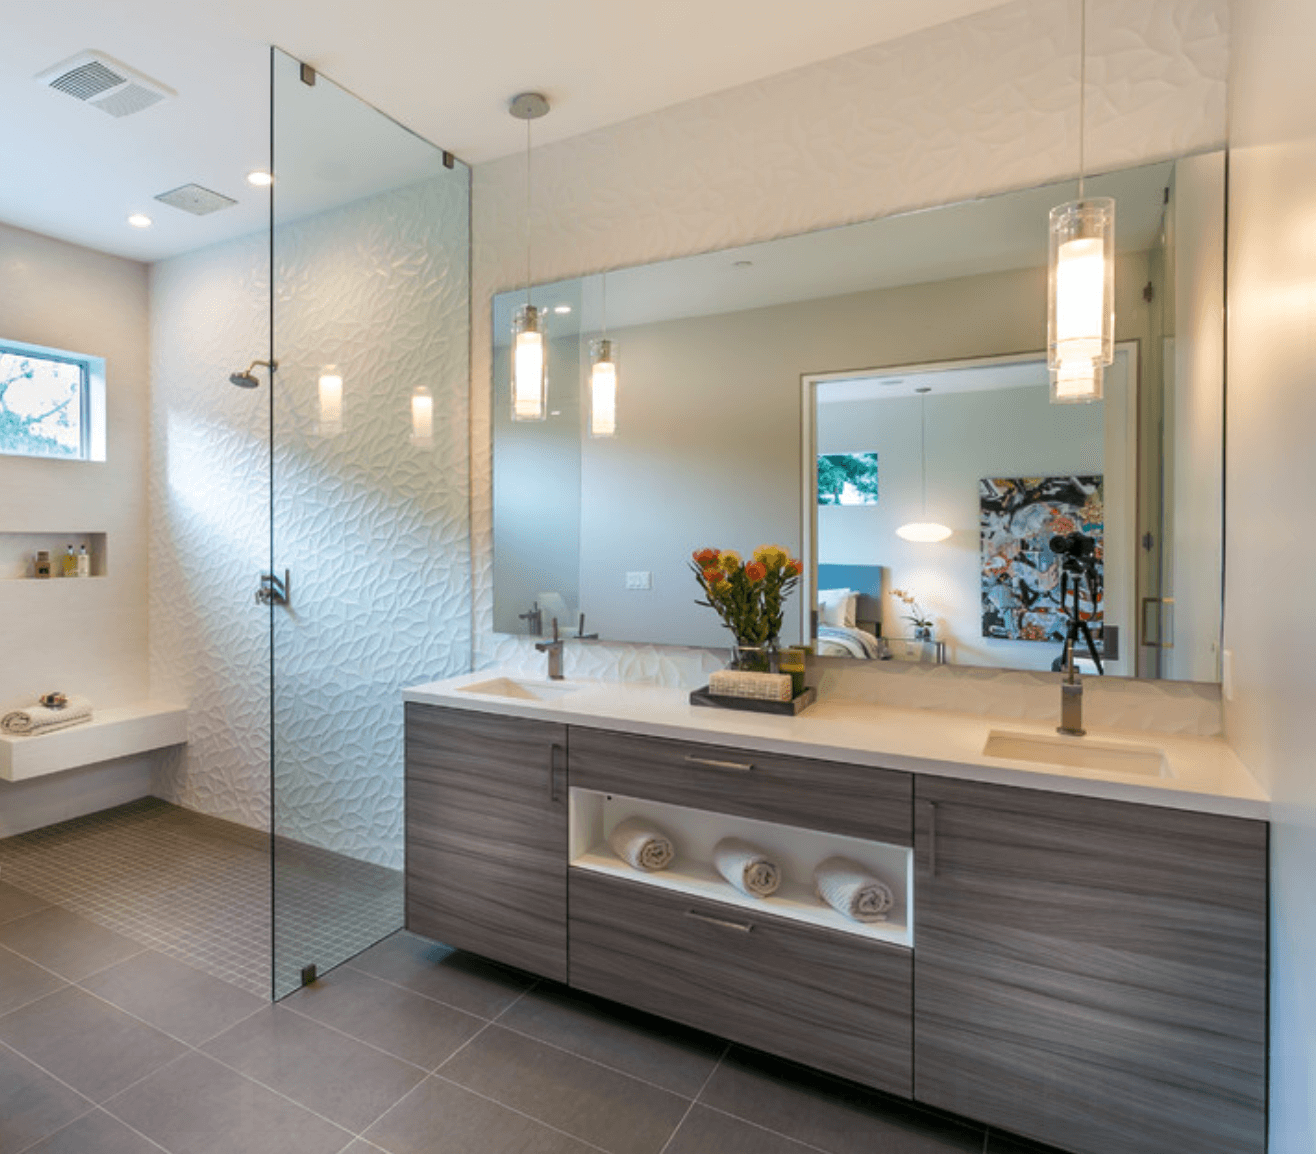 Banheiro Banheiro Moderno #7E674D 1316x1154 Armario Para Banheiro De Vidro